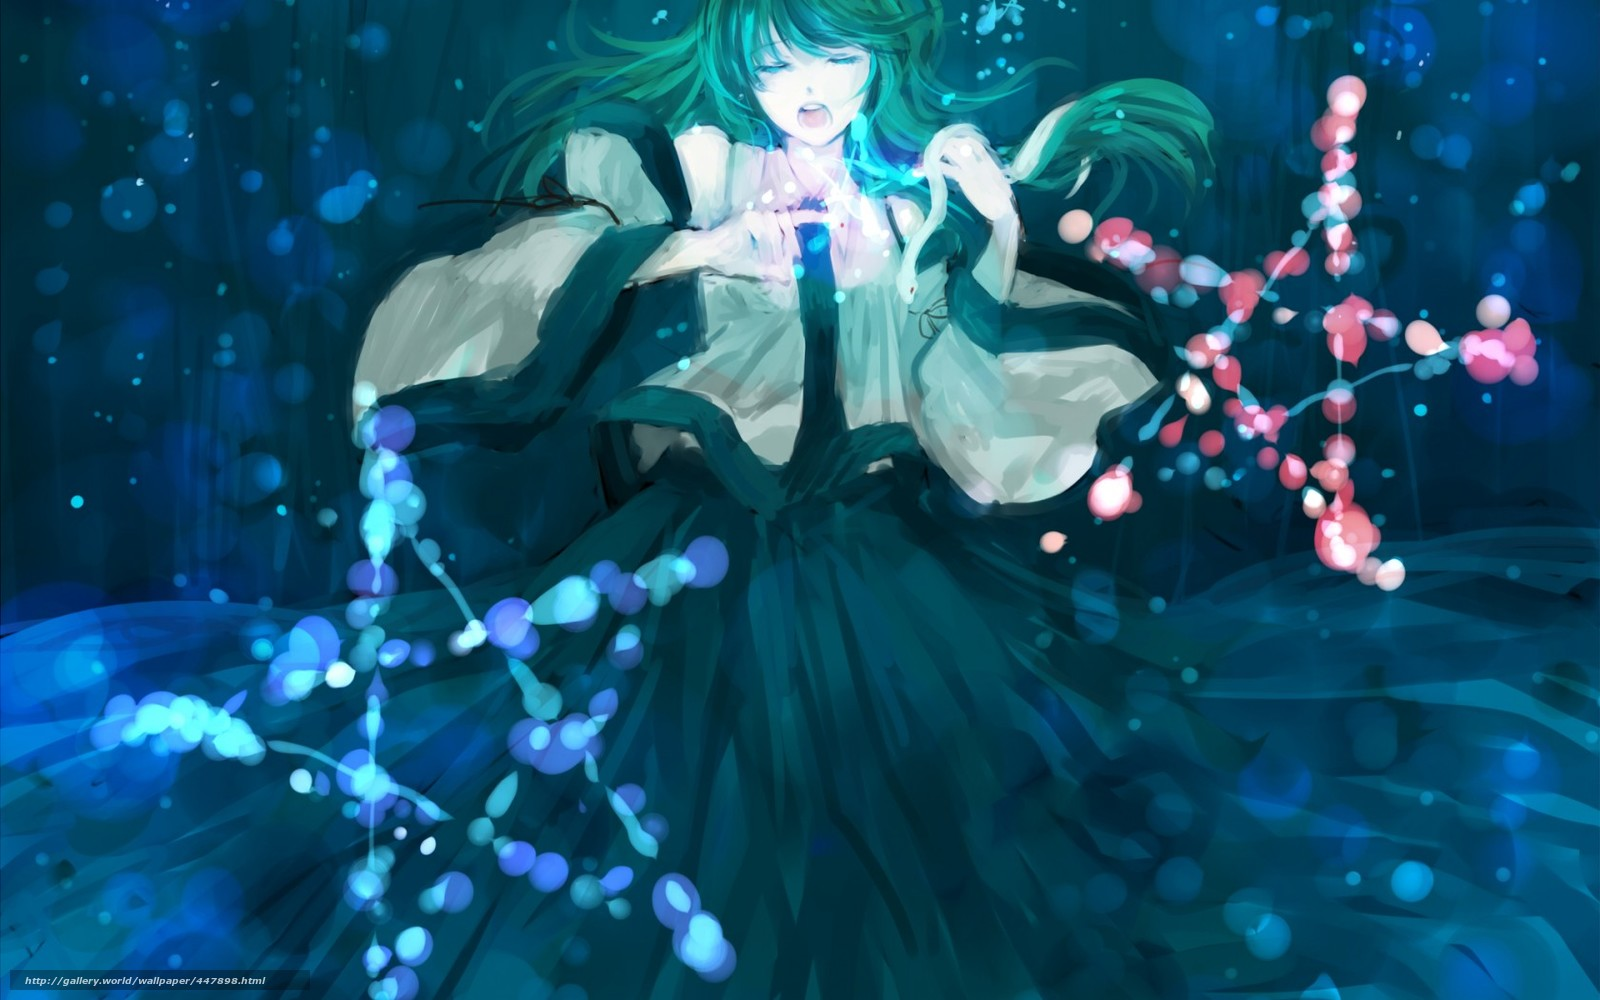 Картинки аниме магия - ba717